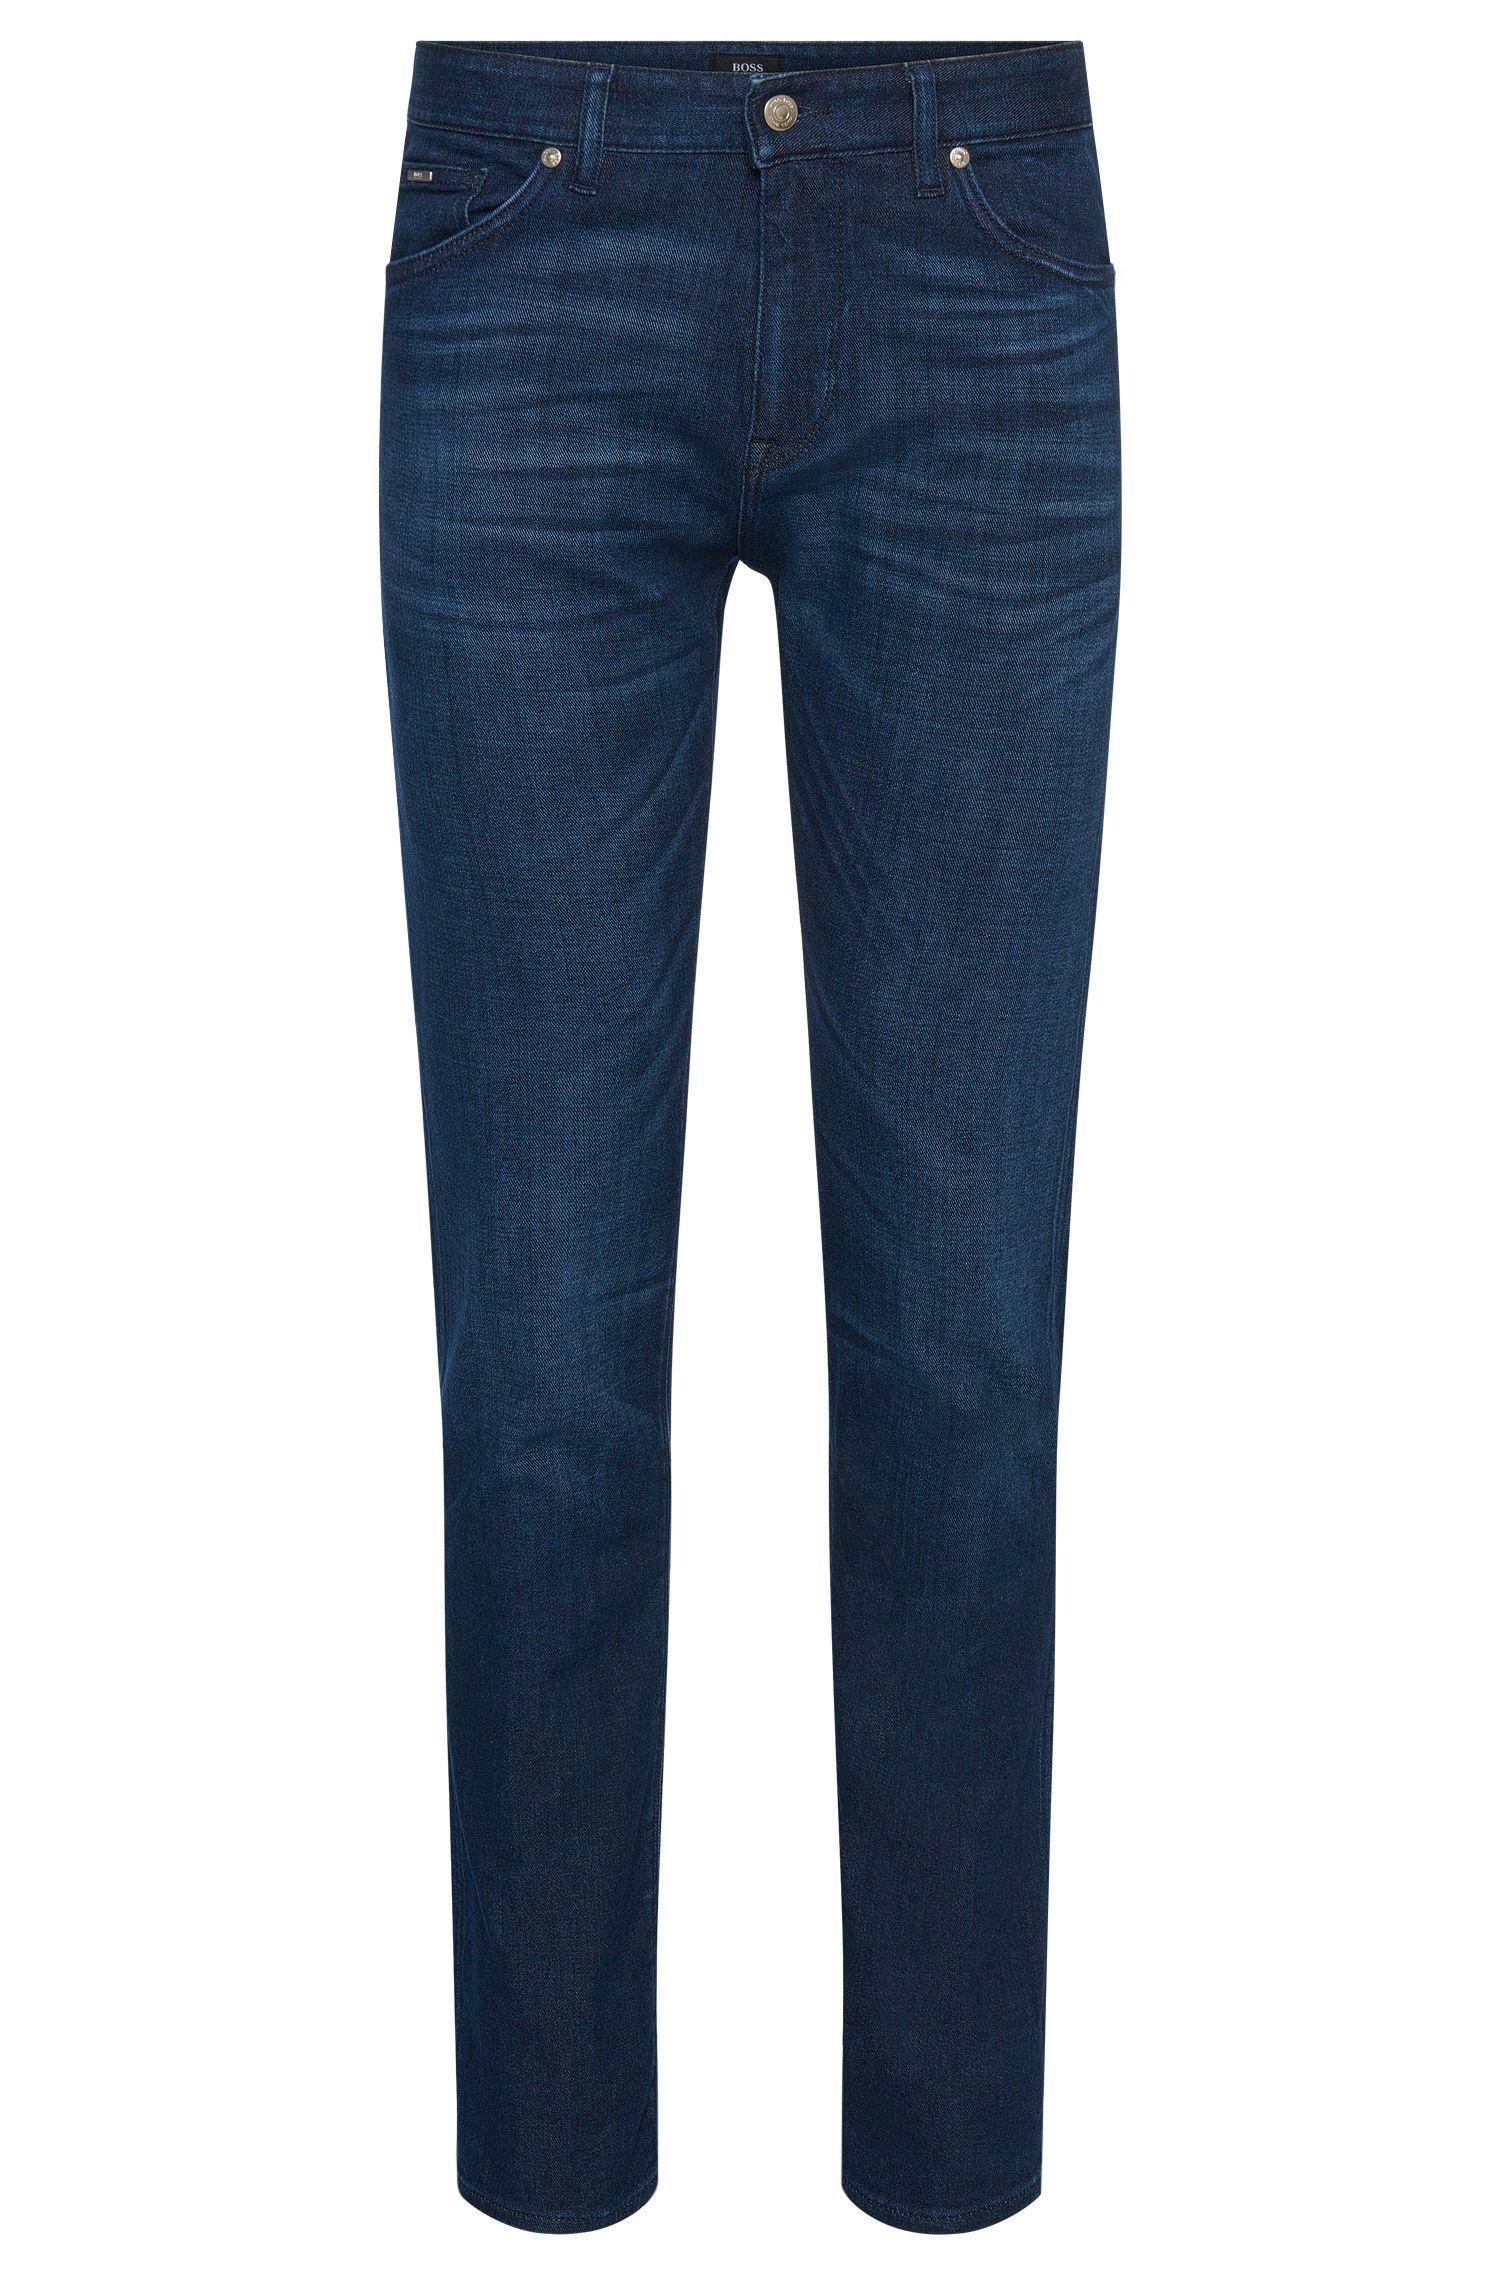 10 oz Stretch Cotton Blend Jeans, Regular Fit | Maine